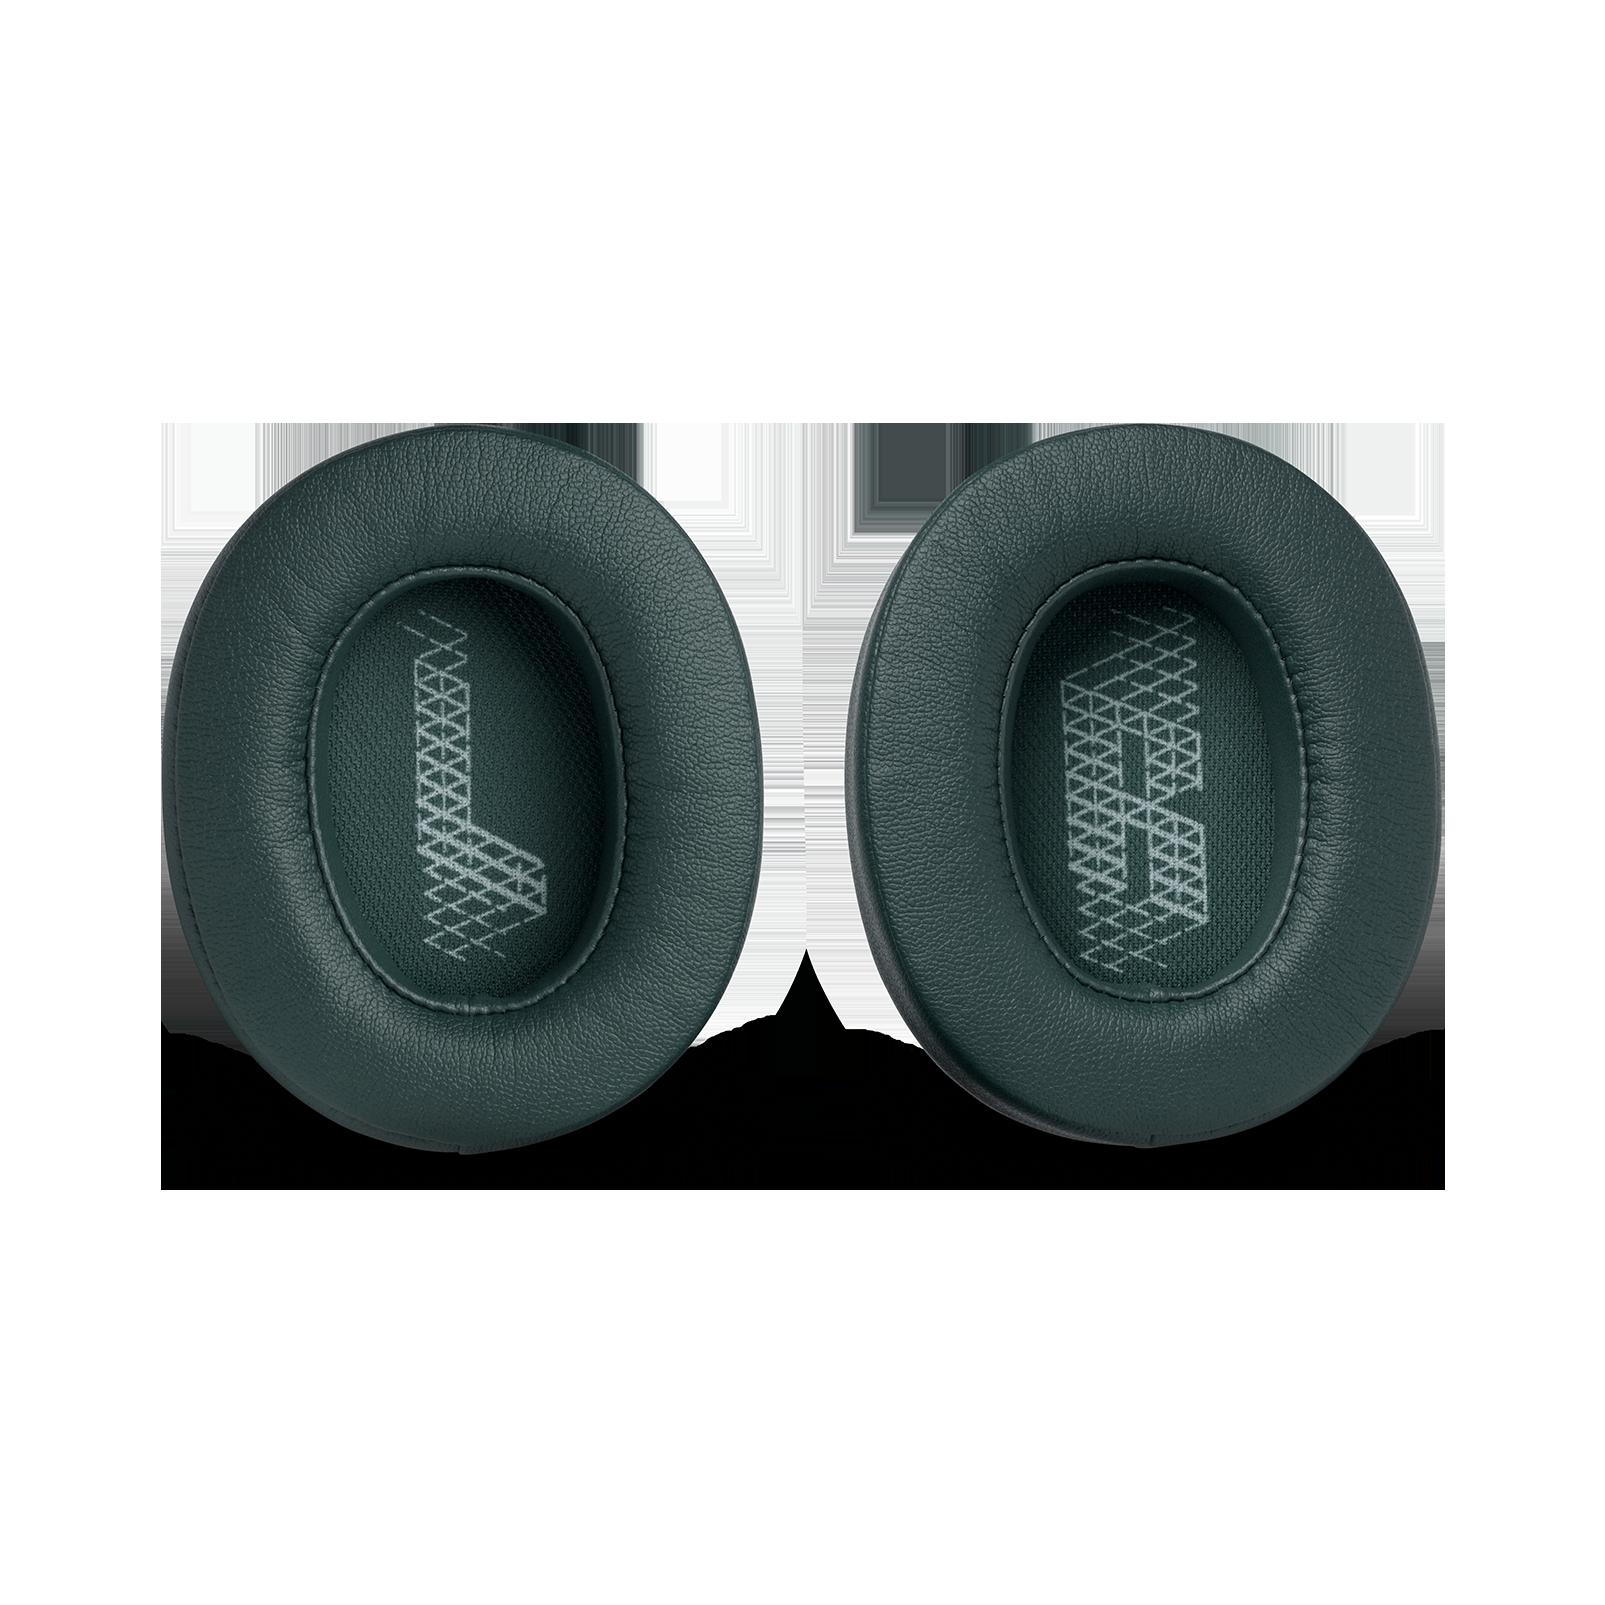 JBL Ear pads for Live 500 - Teal - Ear pads (L+R) - Hero